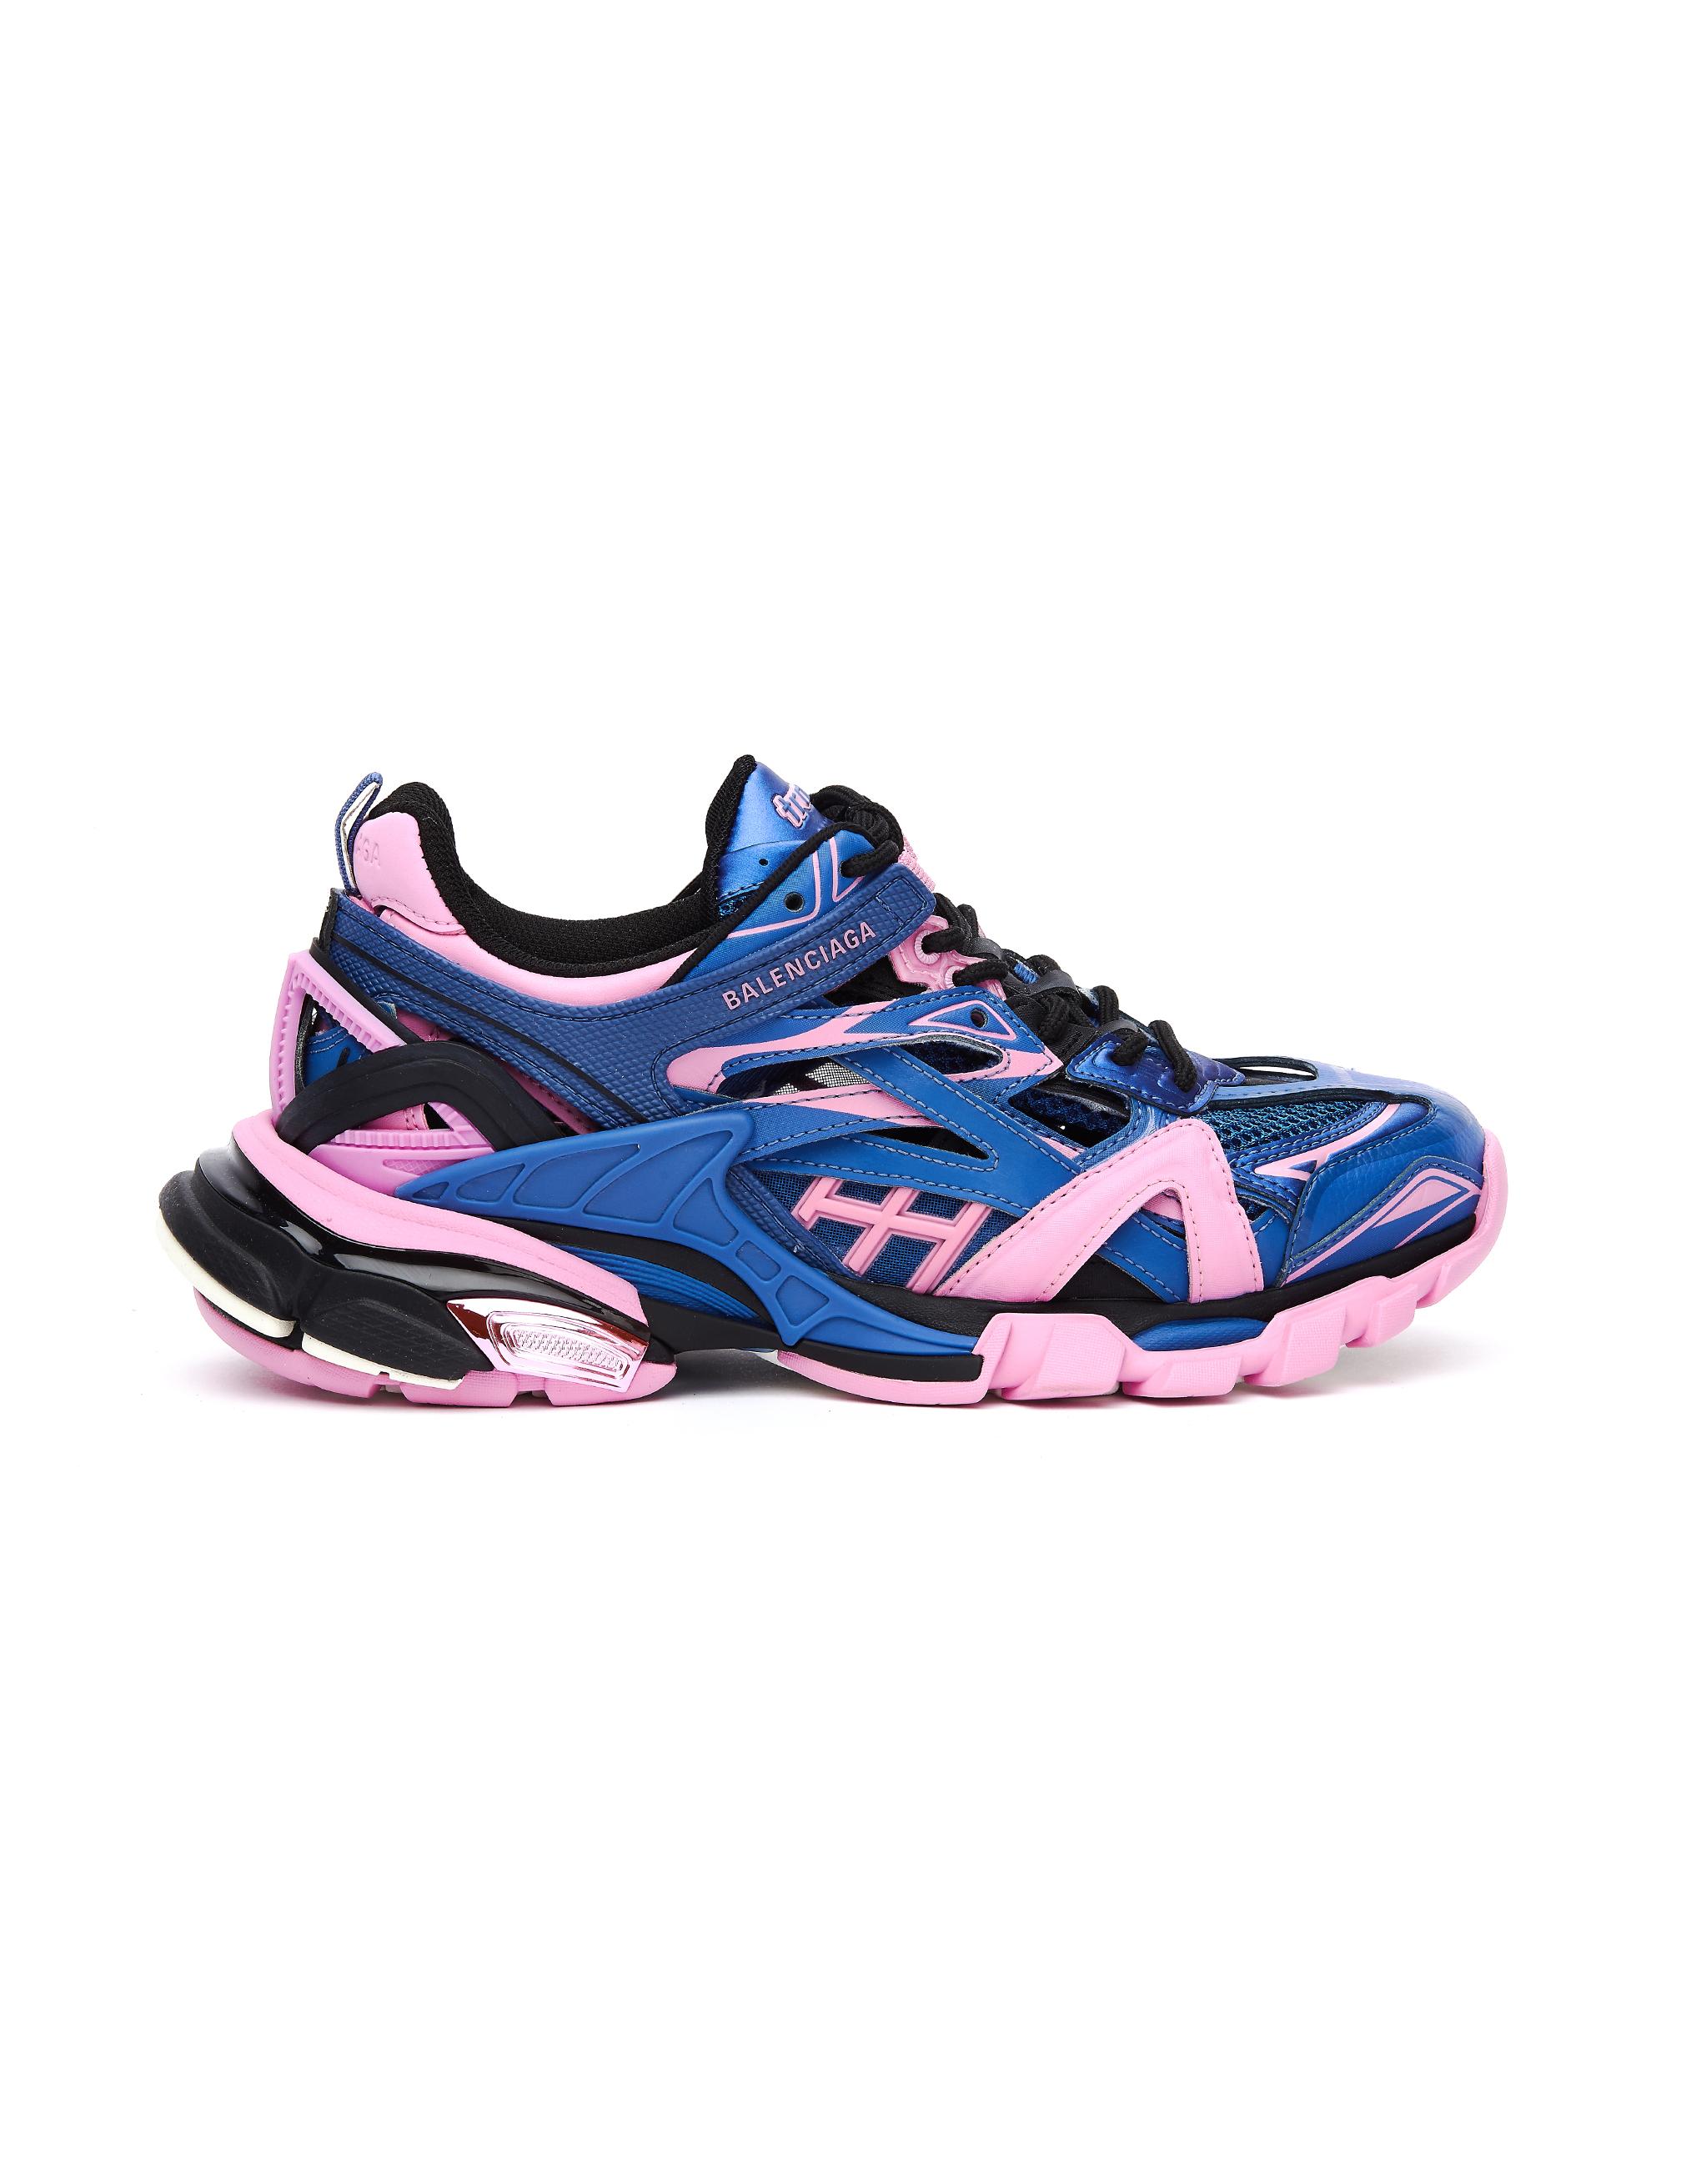 Balenciaga Blue & Pink Track 2 Sneakers